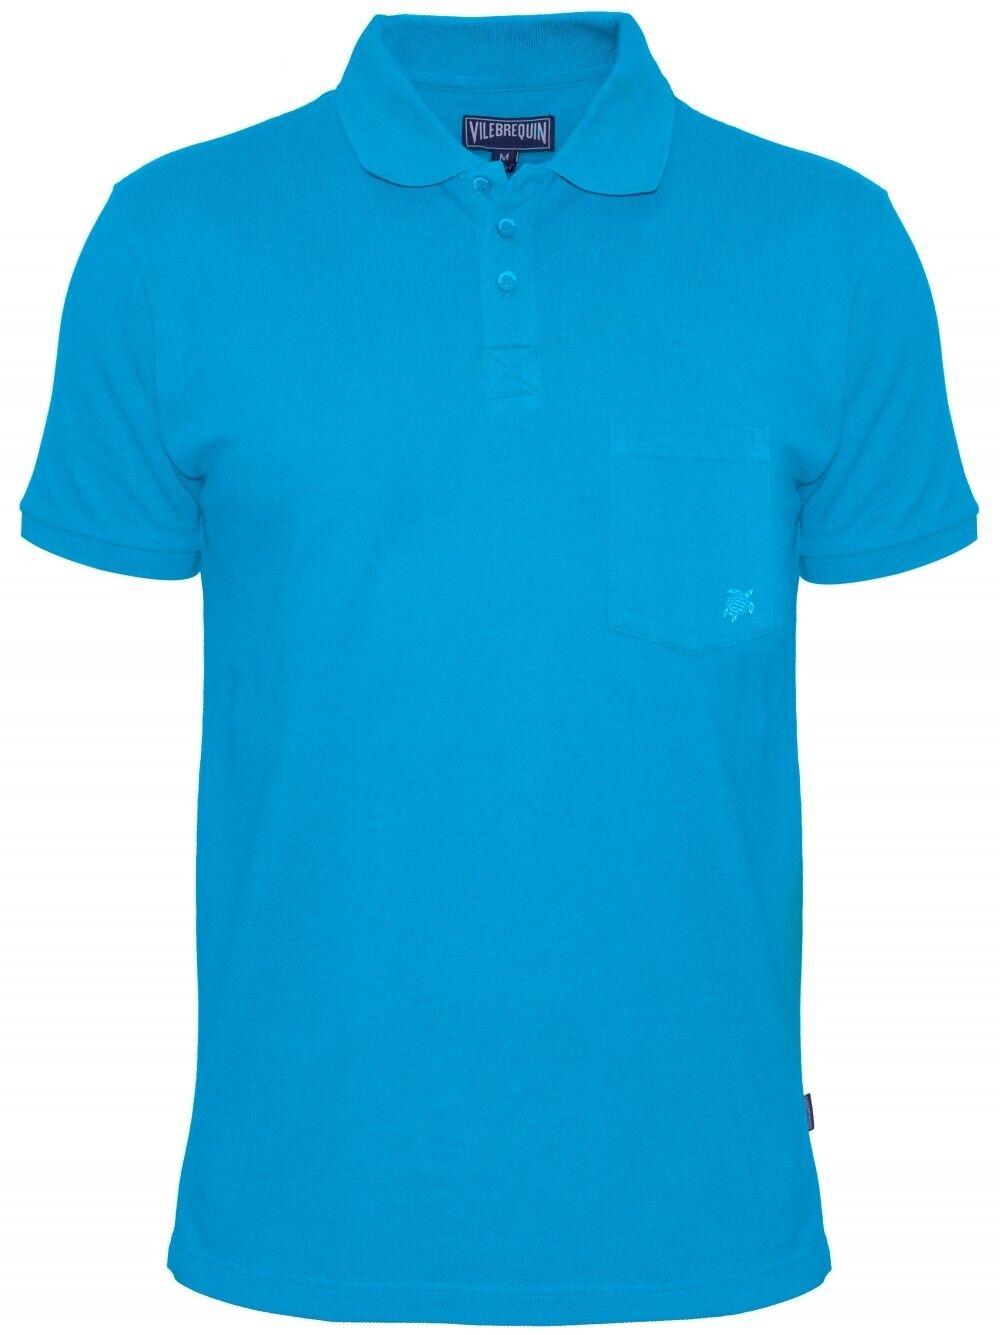 VILEBREQUIN St.Tropez Luxus Preppy Cotton Poloshirt Royal blue Gr.XL 54 NEU